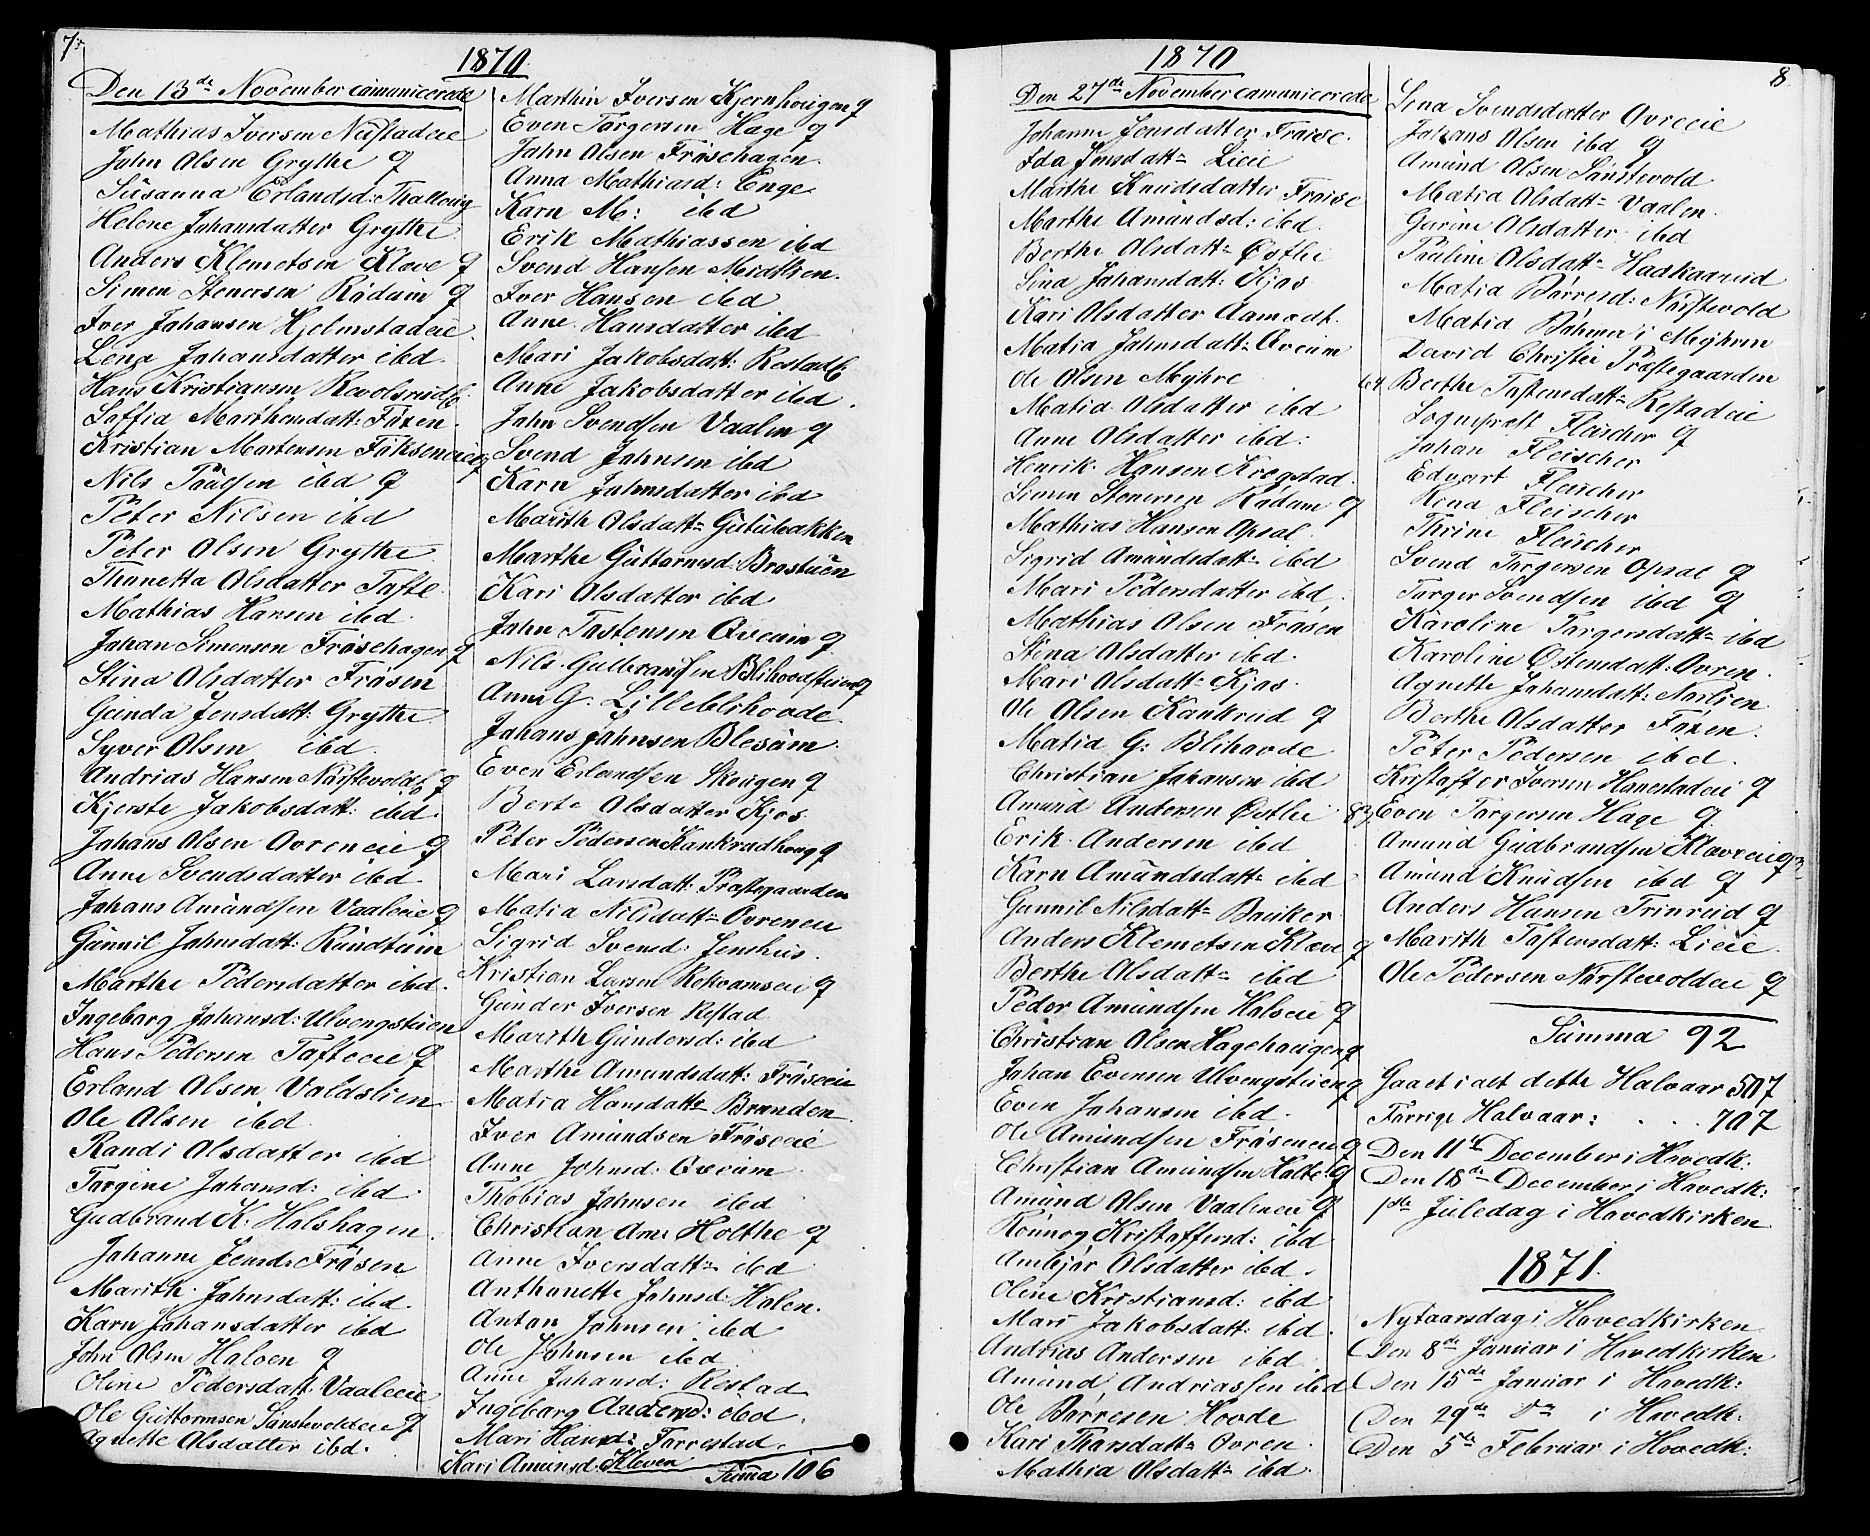 SAH, Østre Gausdal prestekontor, Klokkerbok nr. 1, 1863-1893, s. 7-8